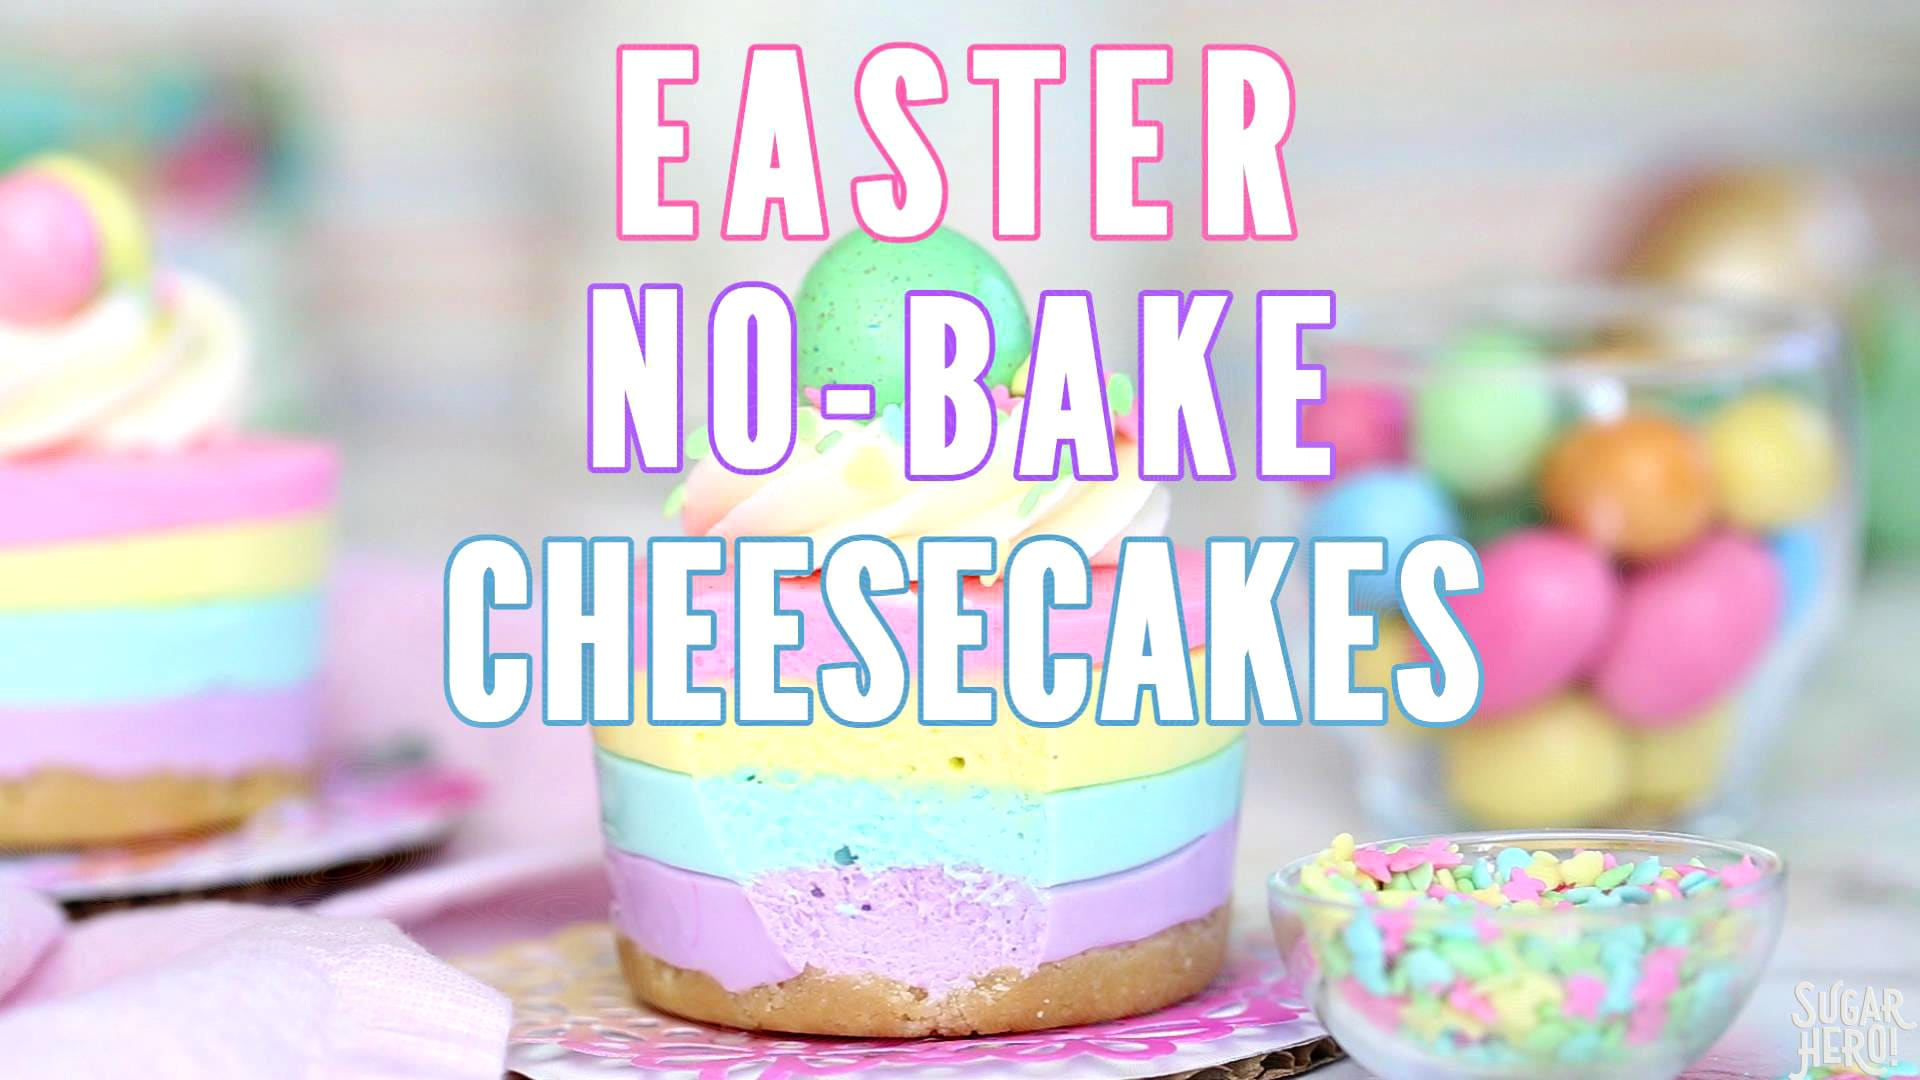 Easter NoBake Mini Cheesecakes SugarHero